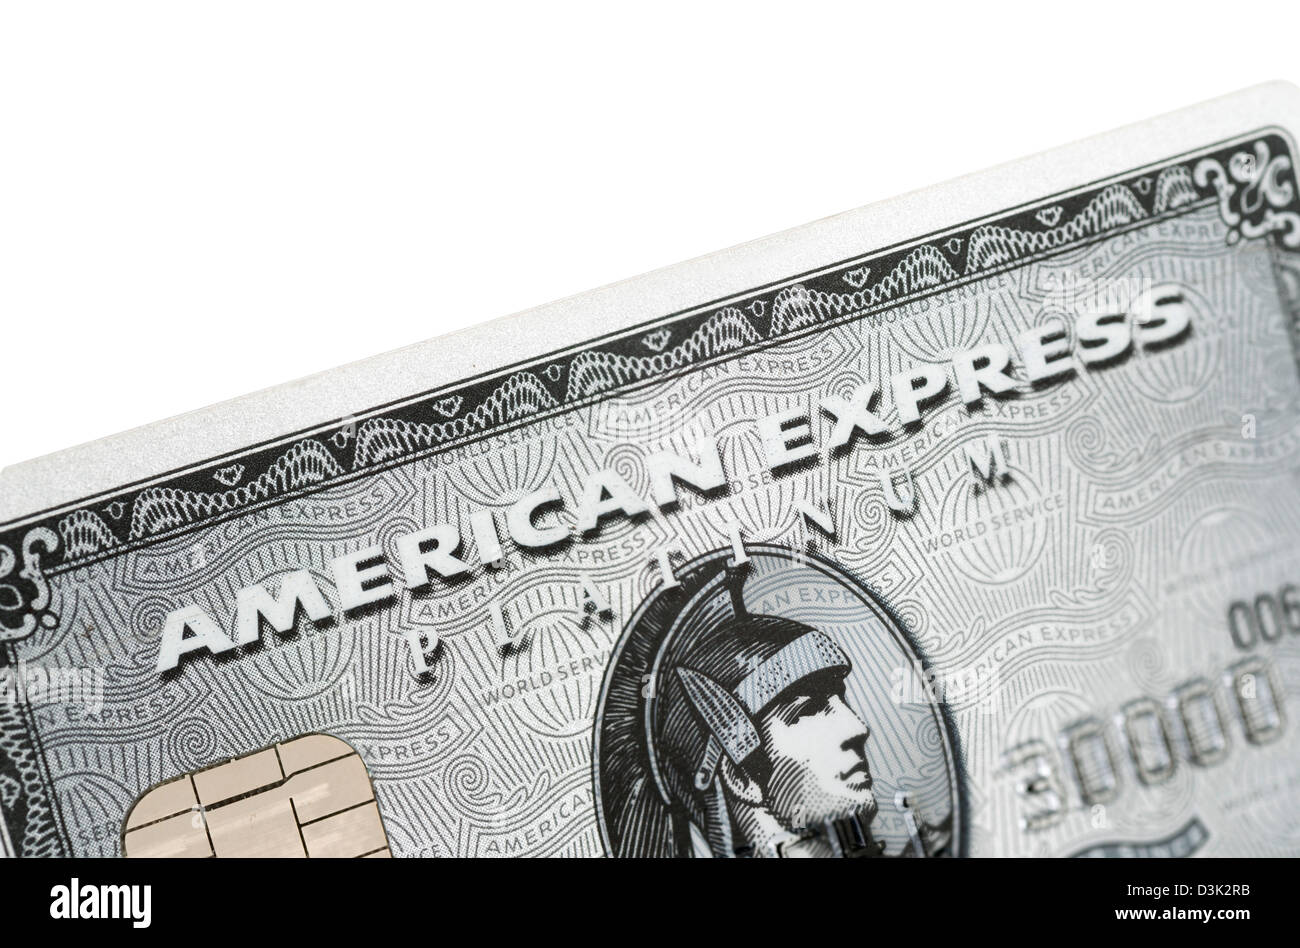 American Express Platinum Kreditkarte Stockbild